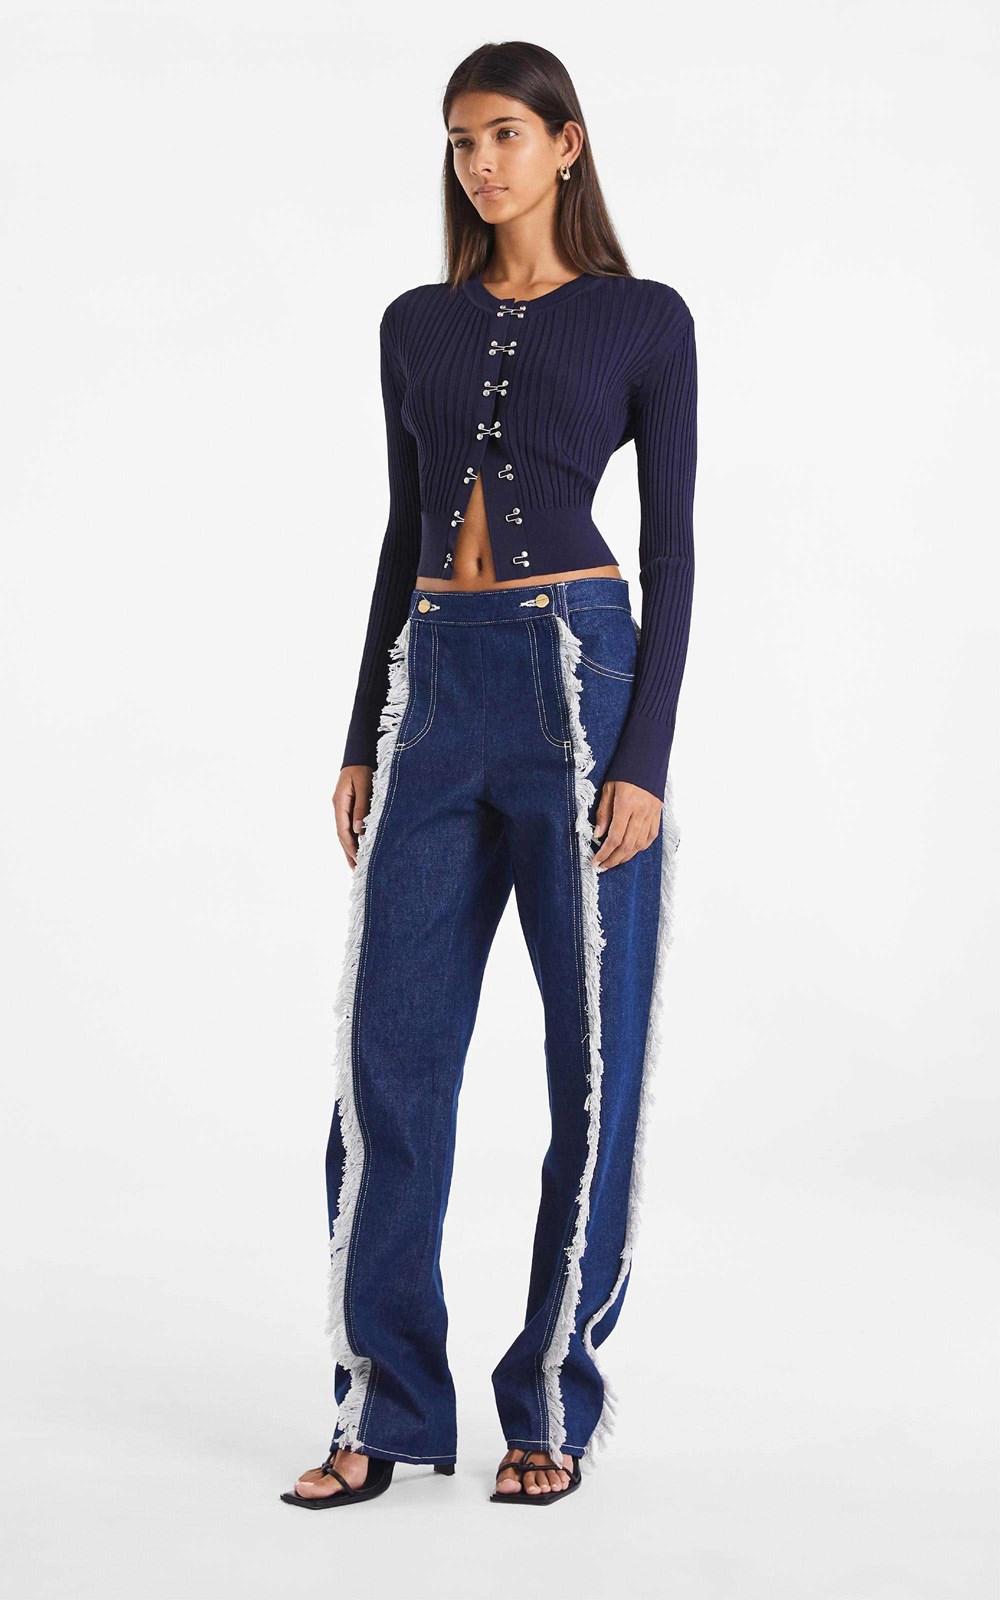 Knitwear | HOOK RIB CARDIGAN